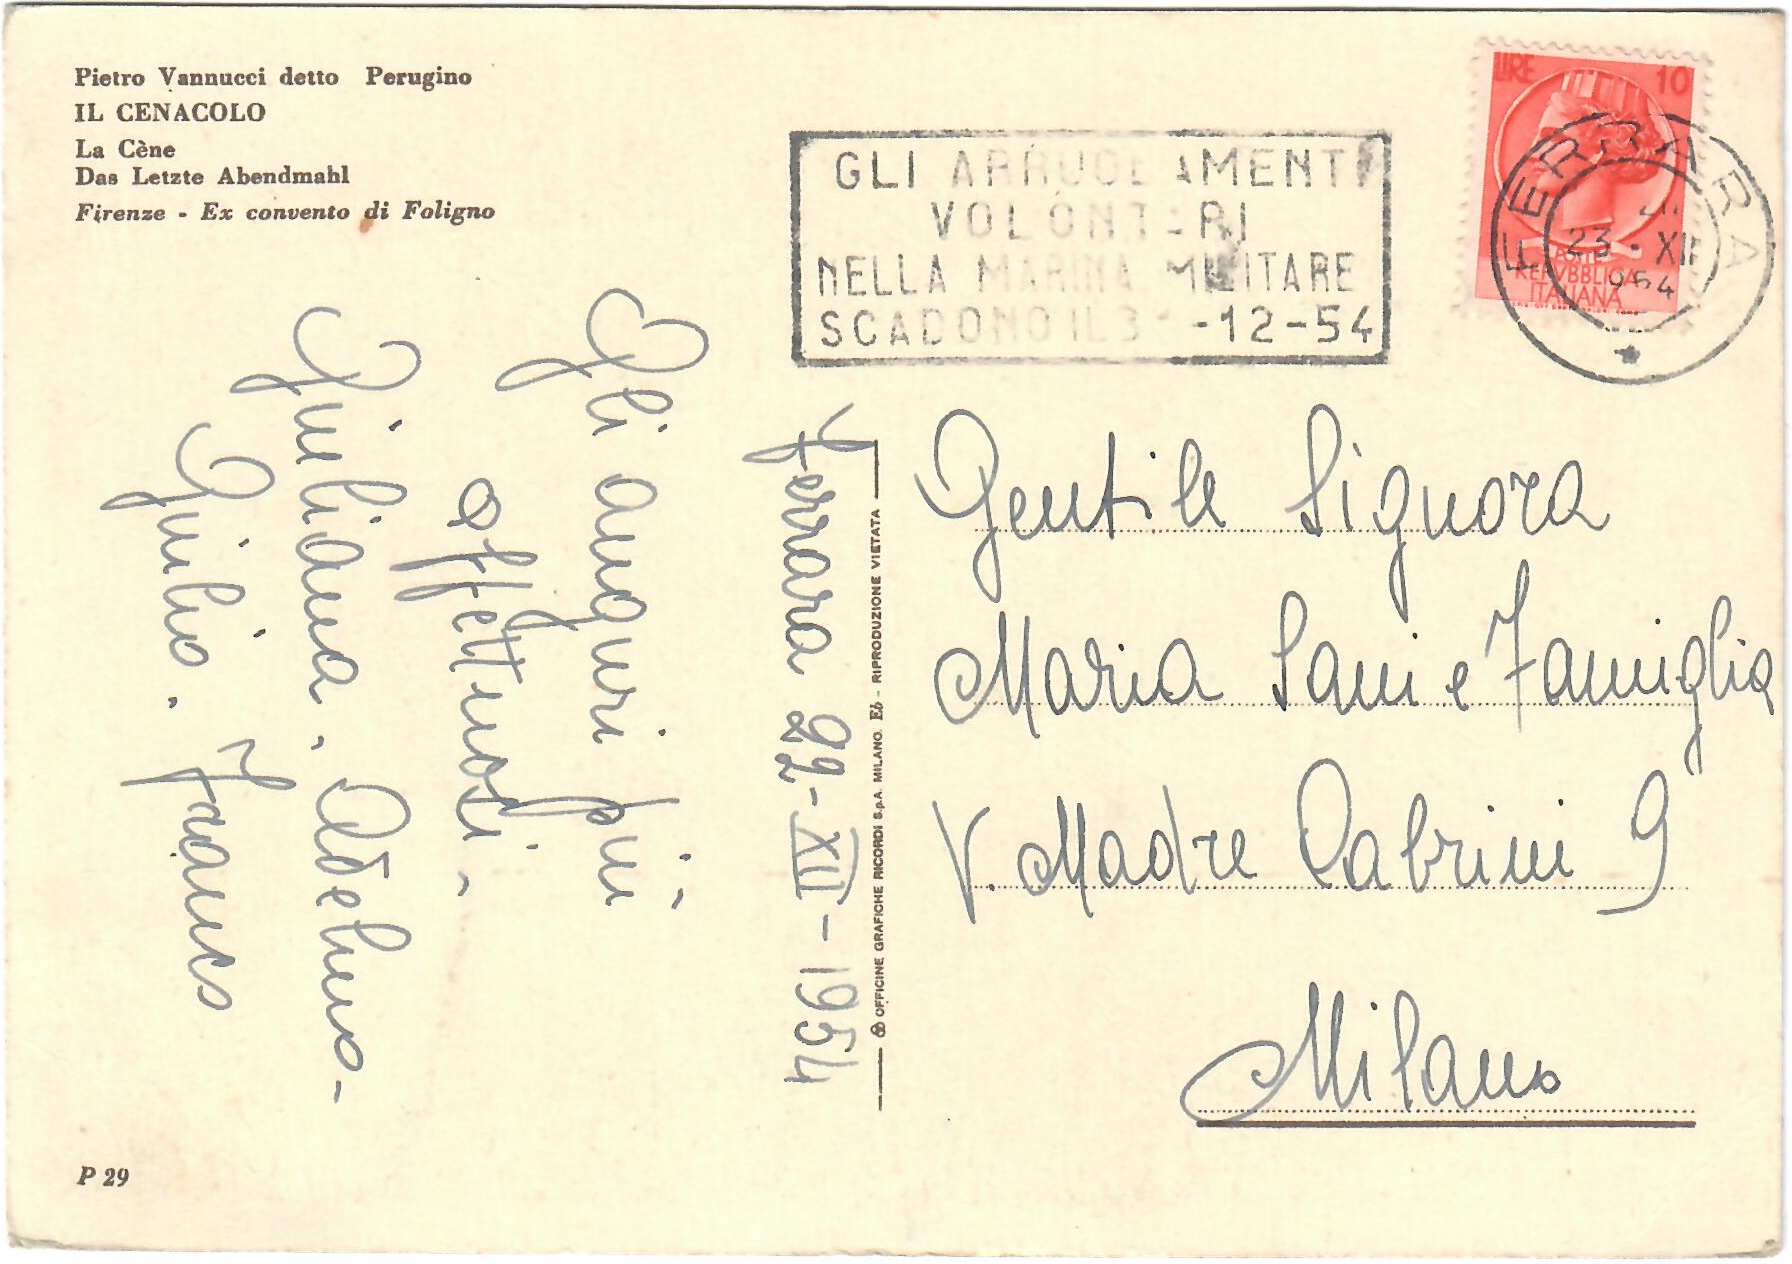 cei0693_isolato_cart5parole_marina